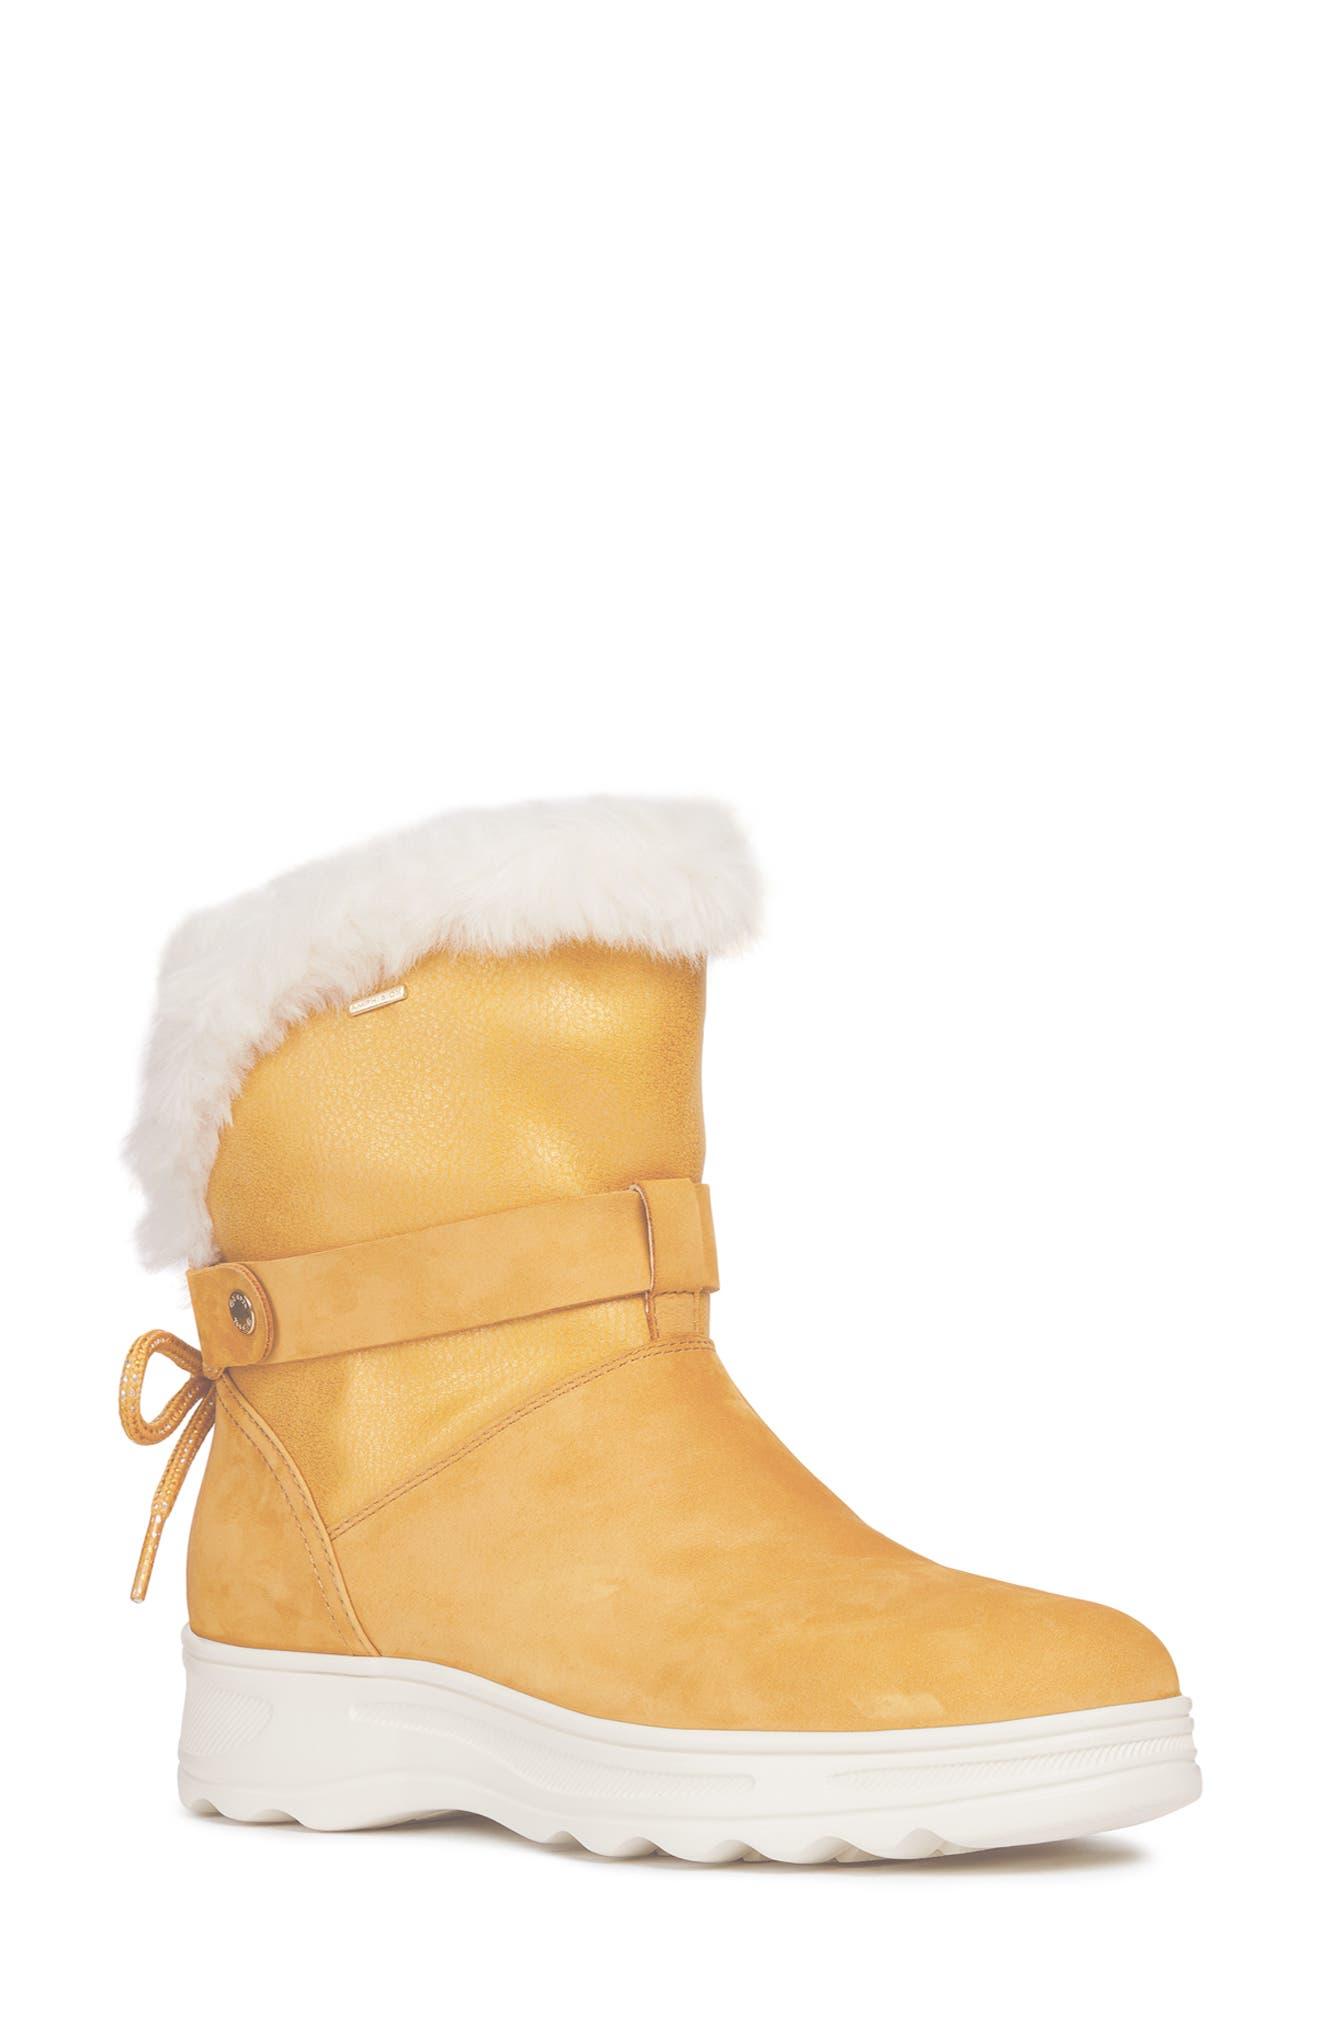 Geox Hosmos Abx Waterproof Faux Fur Trim Boot, Yellow